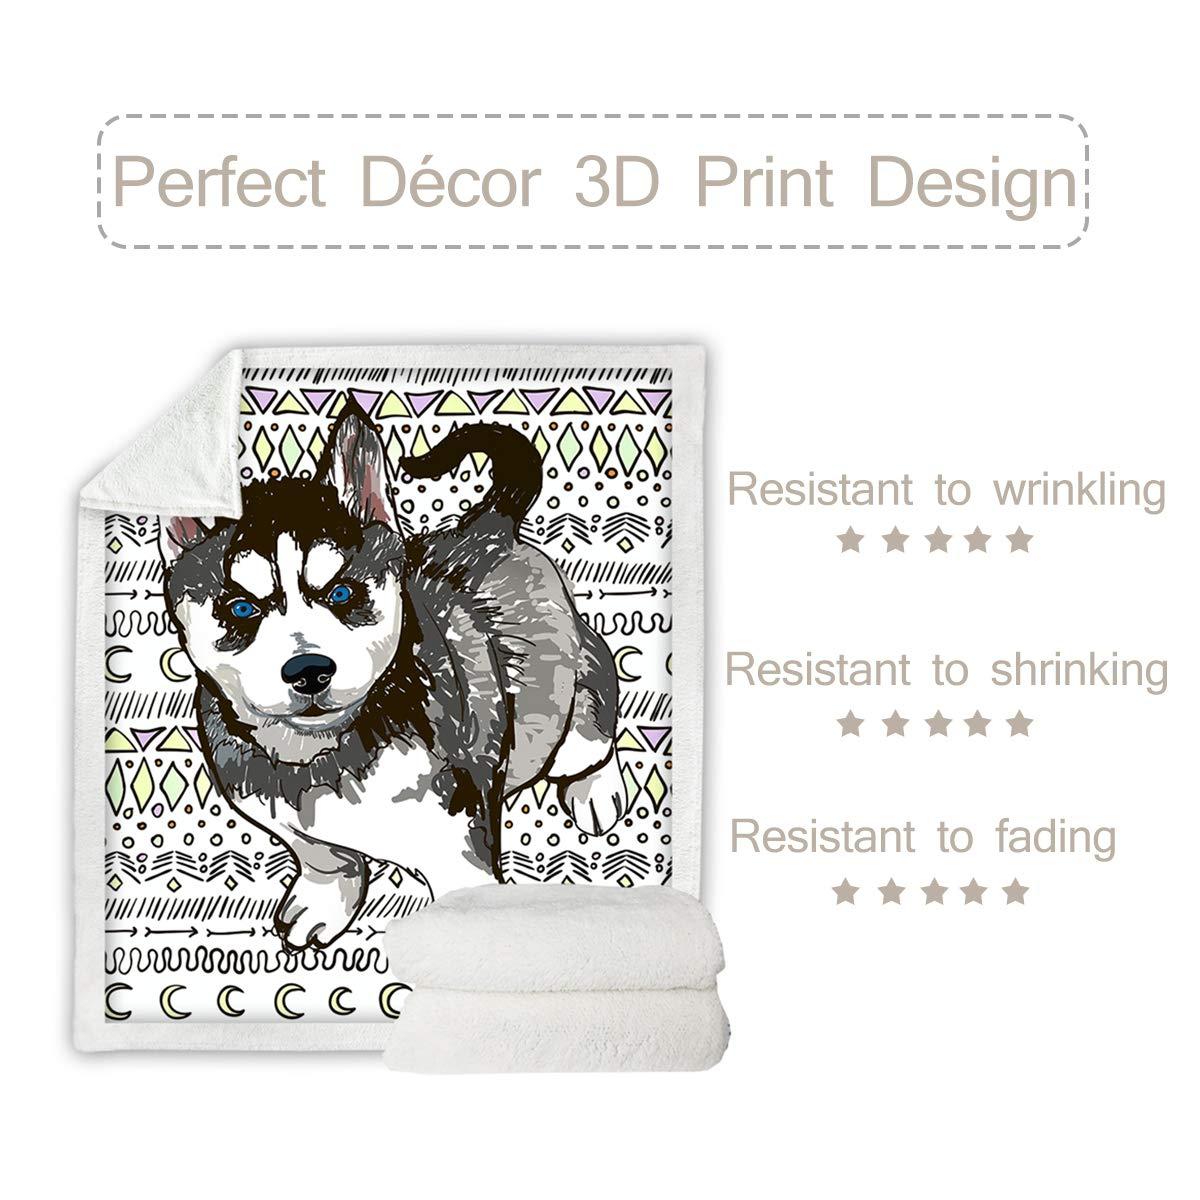 Sleepwish Sherpa Fleece Throw Blanket Siberian Husky Print Couch Sofa Plush Fuzzy Blanket 3D Cute Animals Pattern Blankets for Dog Lovers,Green,Throw 50 X 60